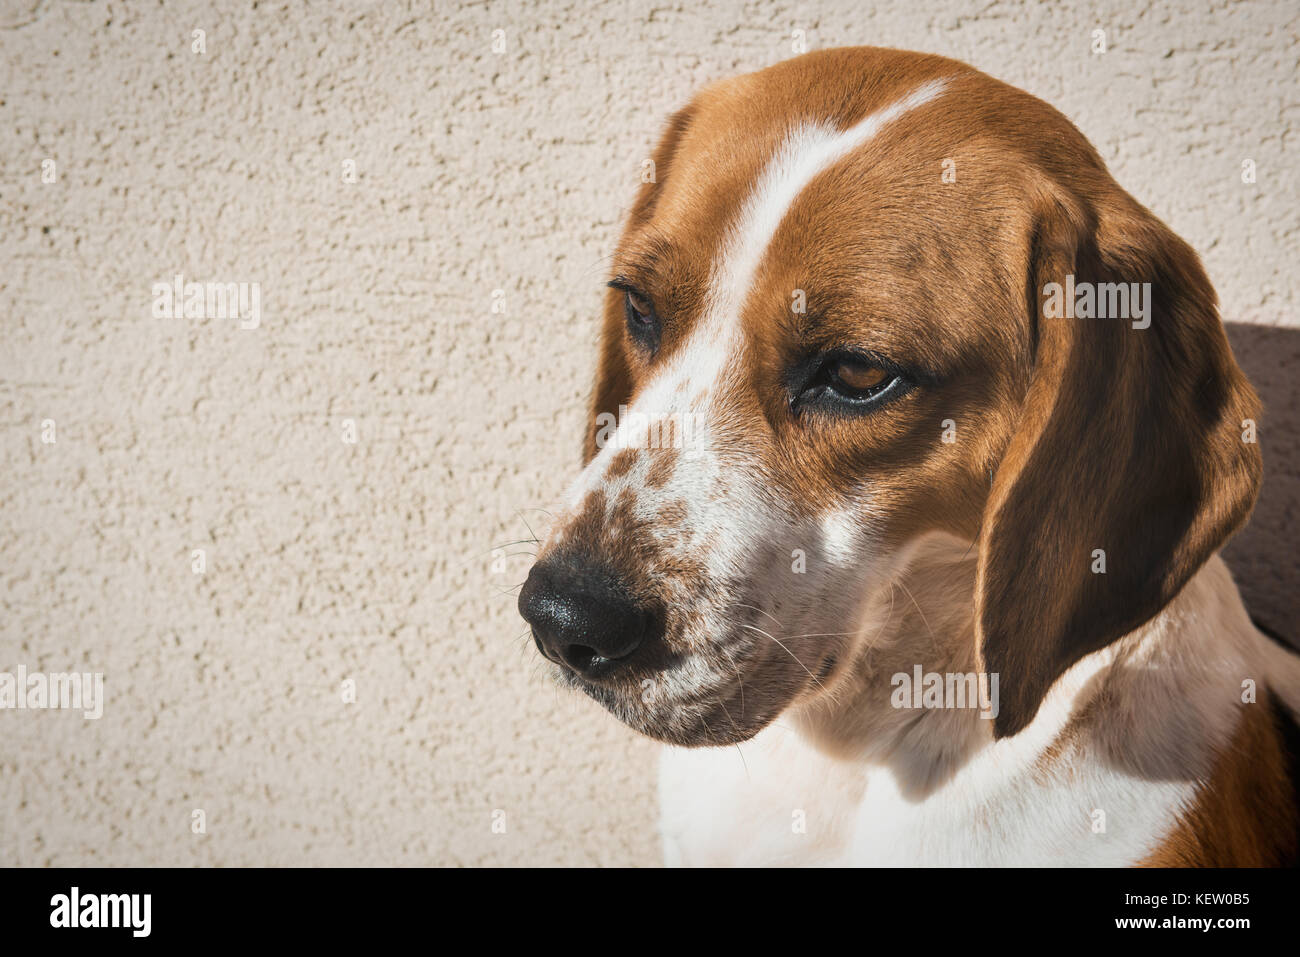 Cute beagle with sad eyes, adoption rescue concept - Stock Image